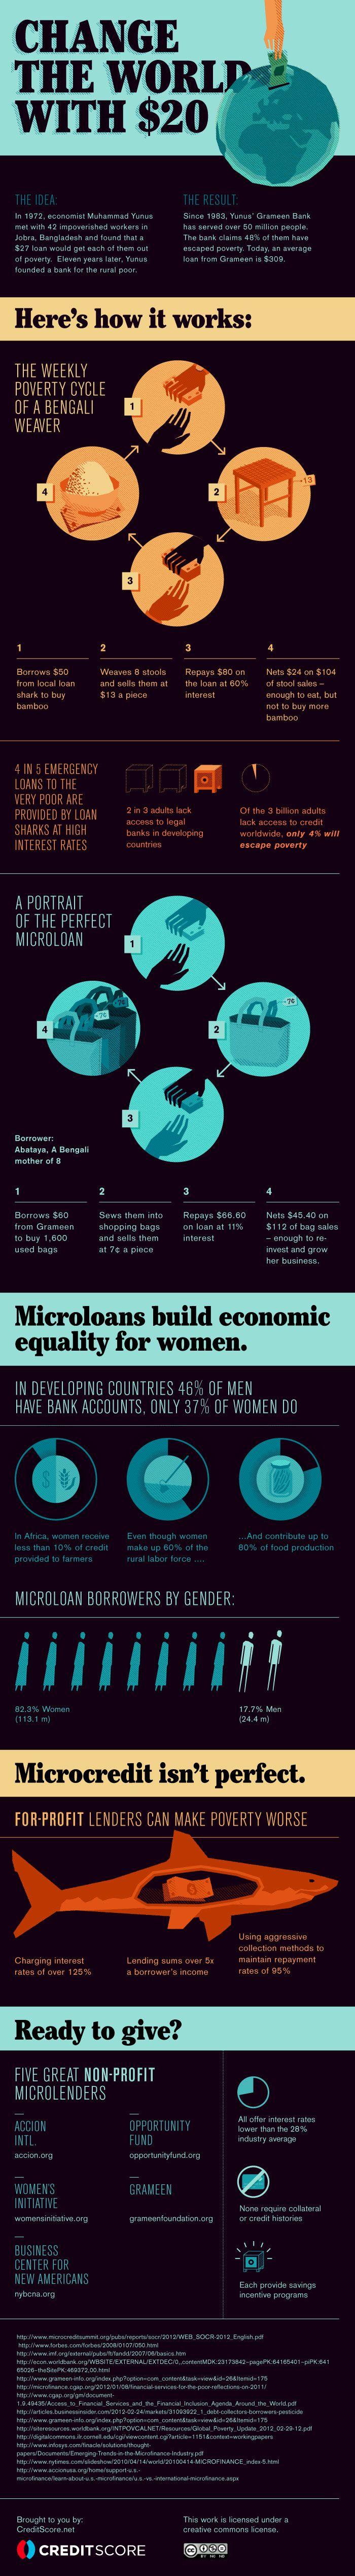 How to Change the World w/ just 20$ (follows economist Muhummad Yunus & www.Kiva.org micro-lending principle)